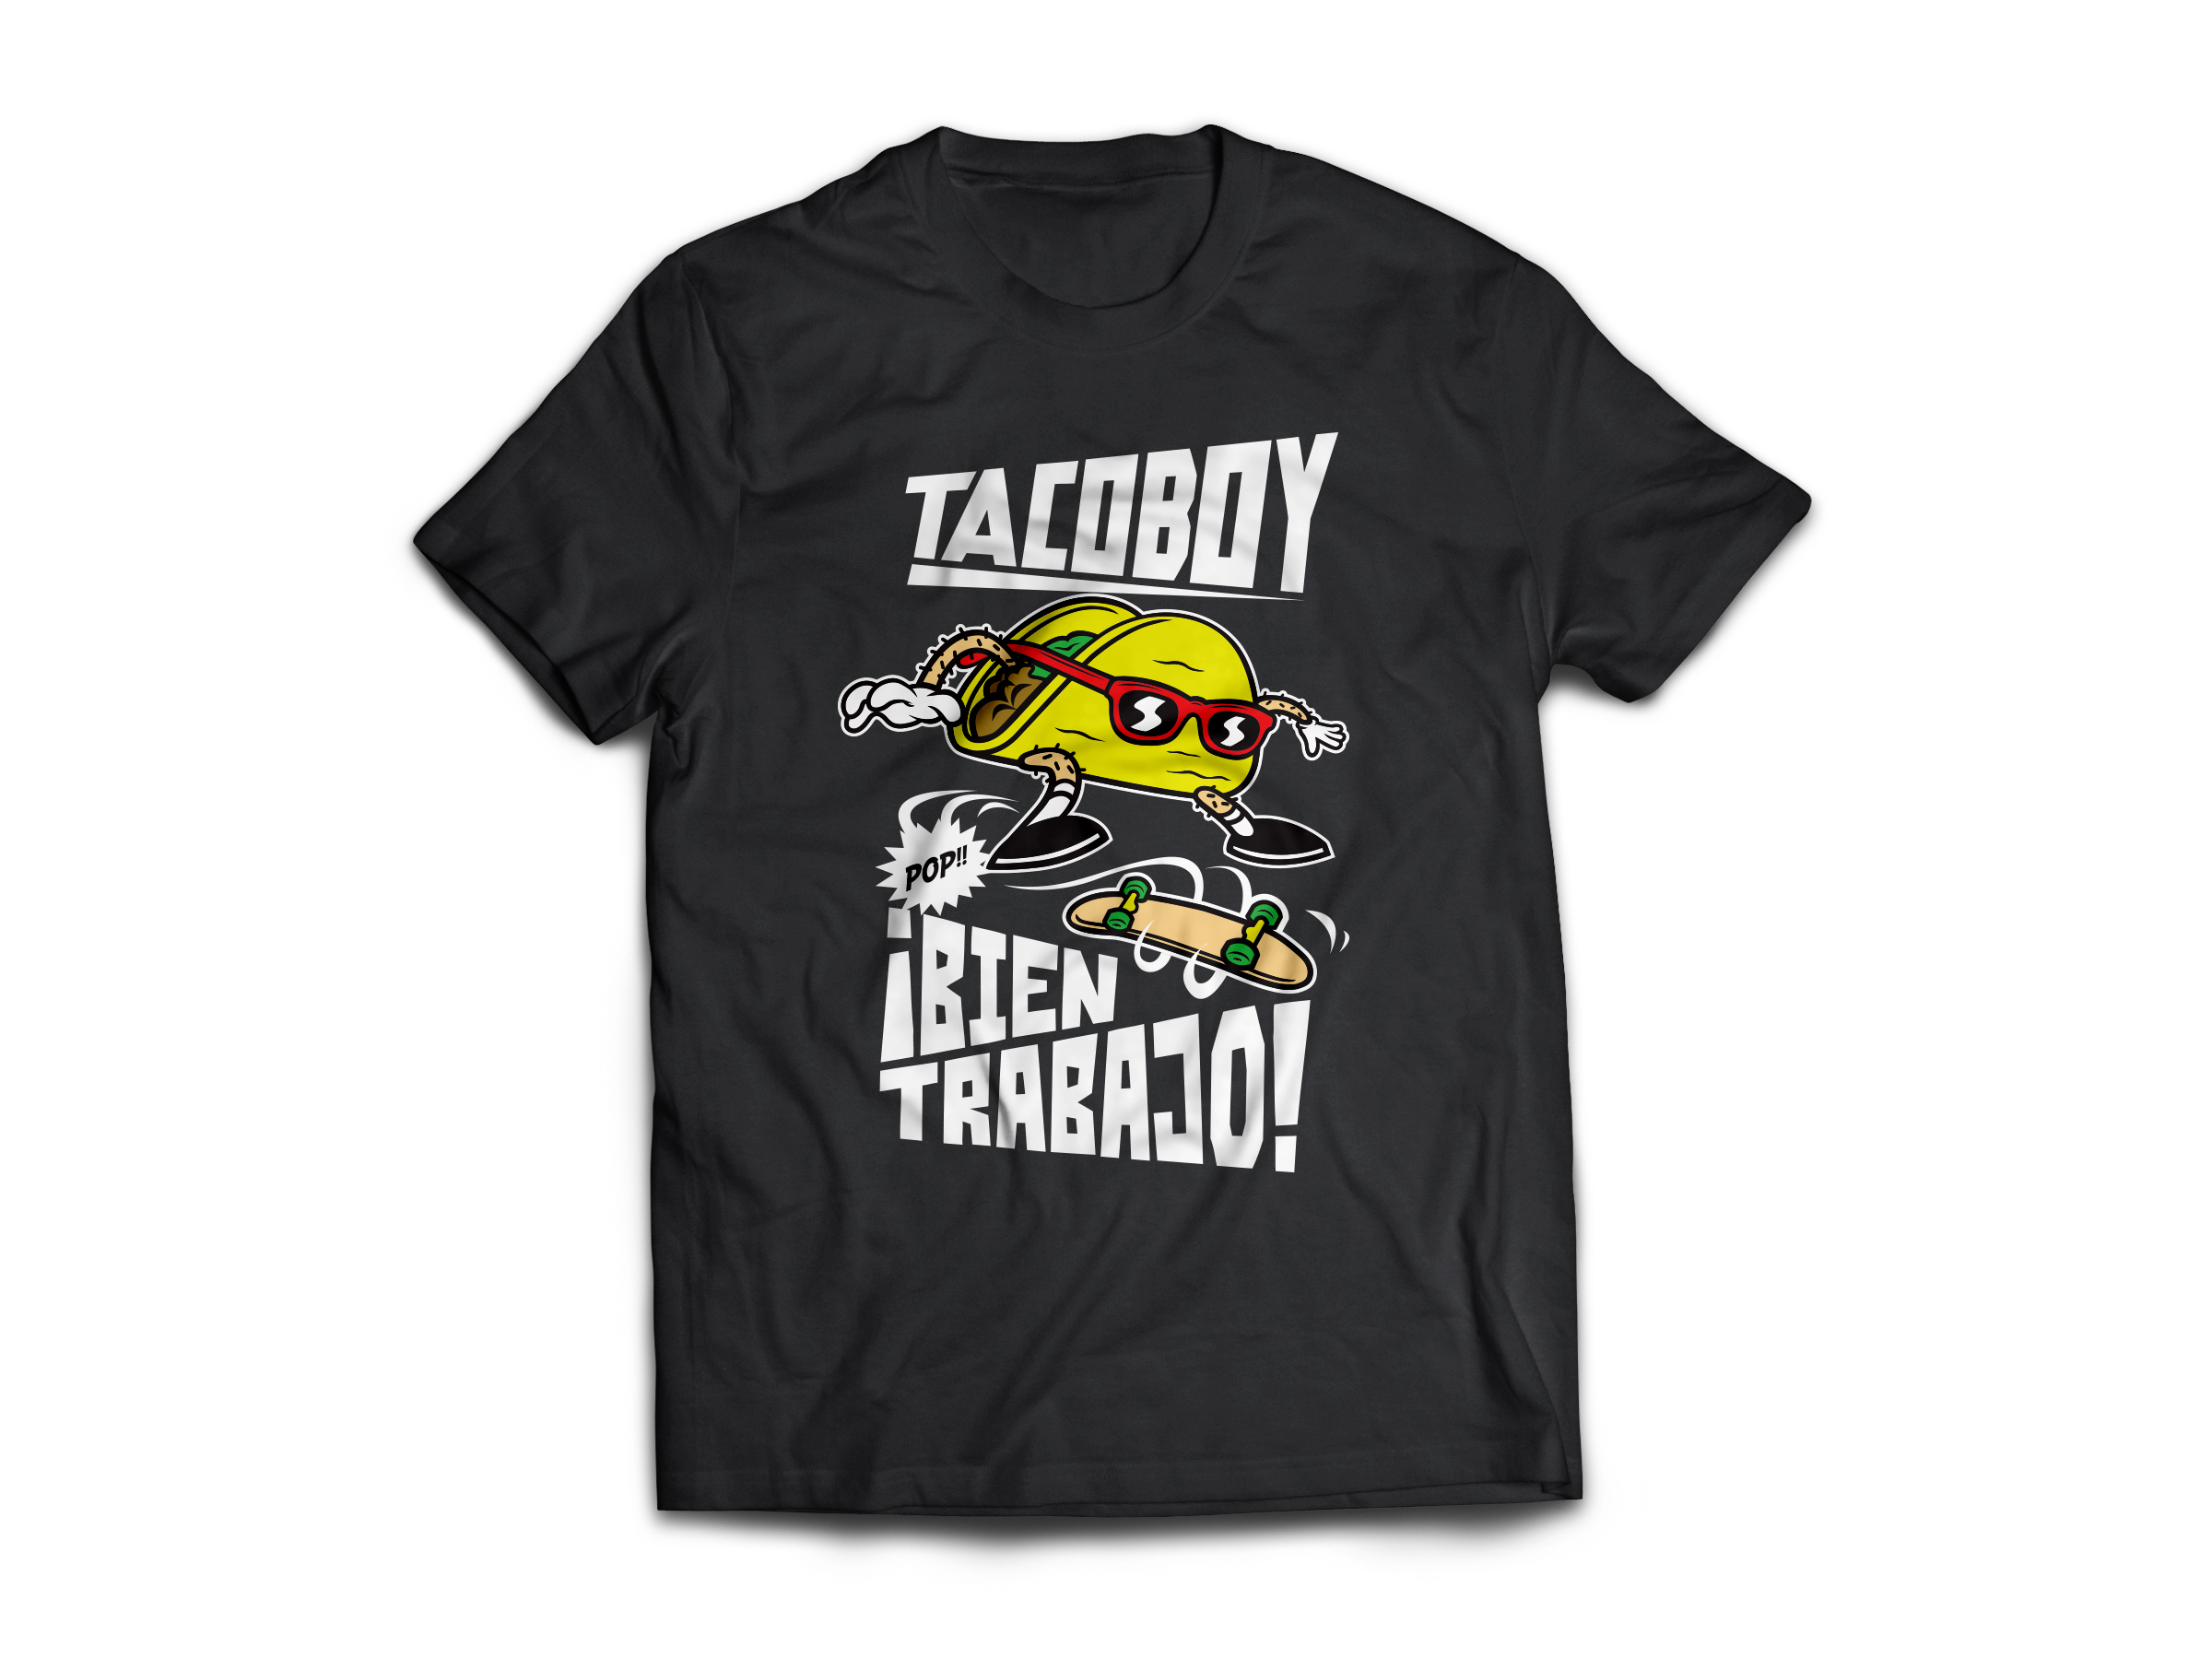 taco boy shirt.jpg